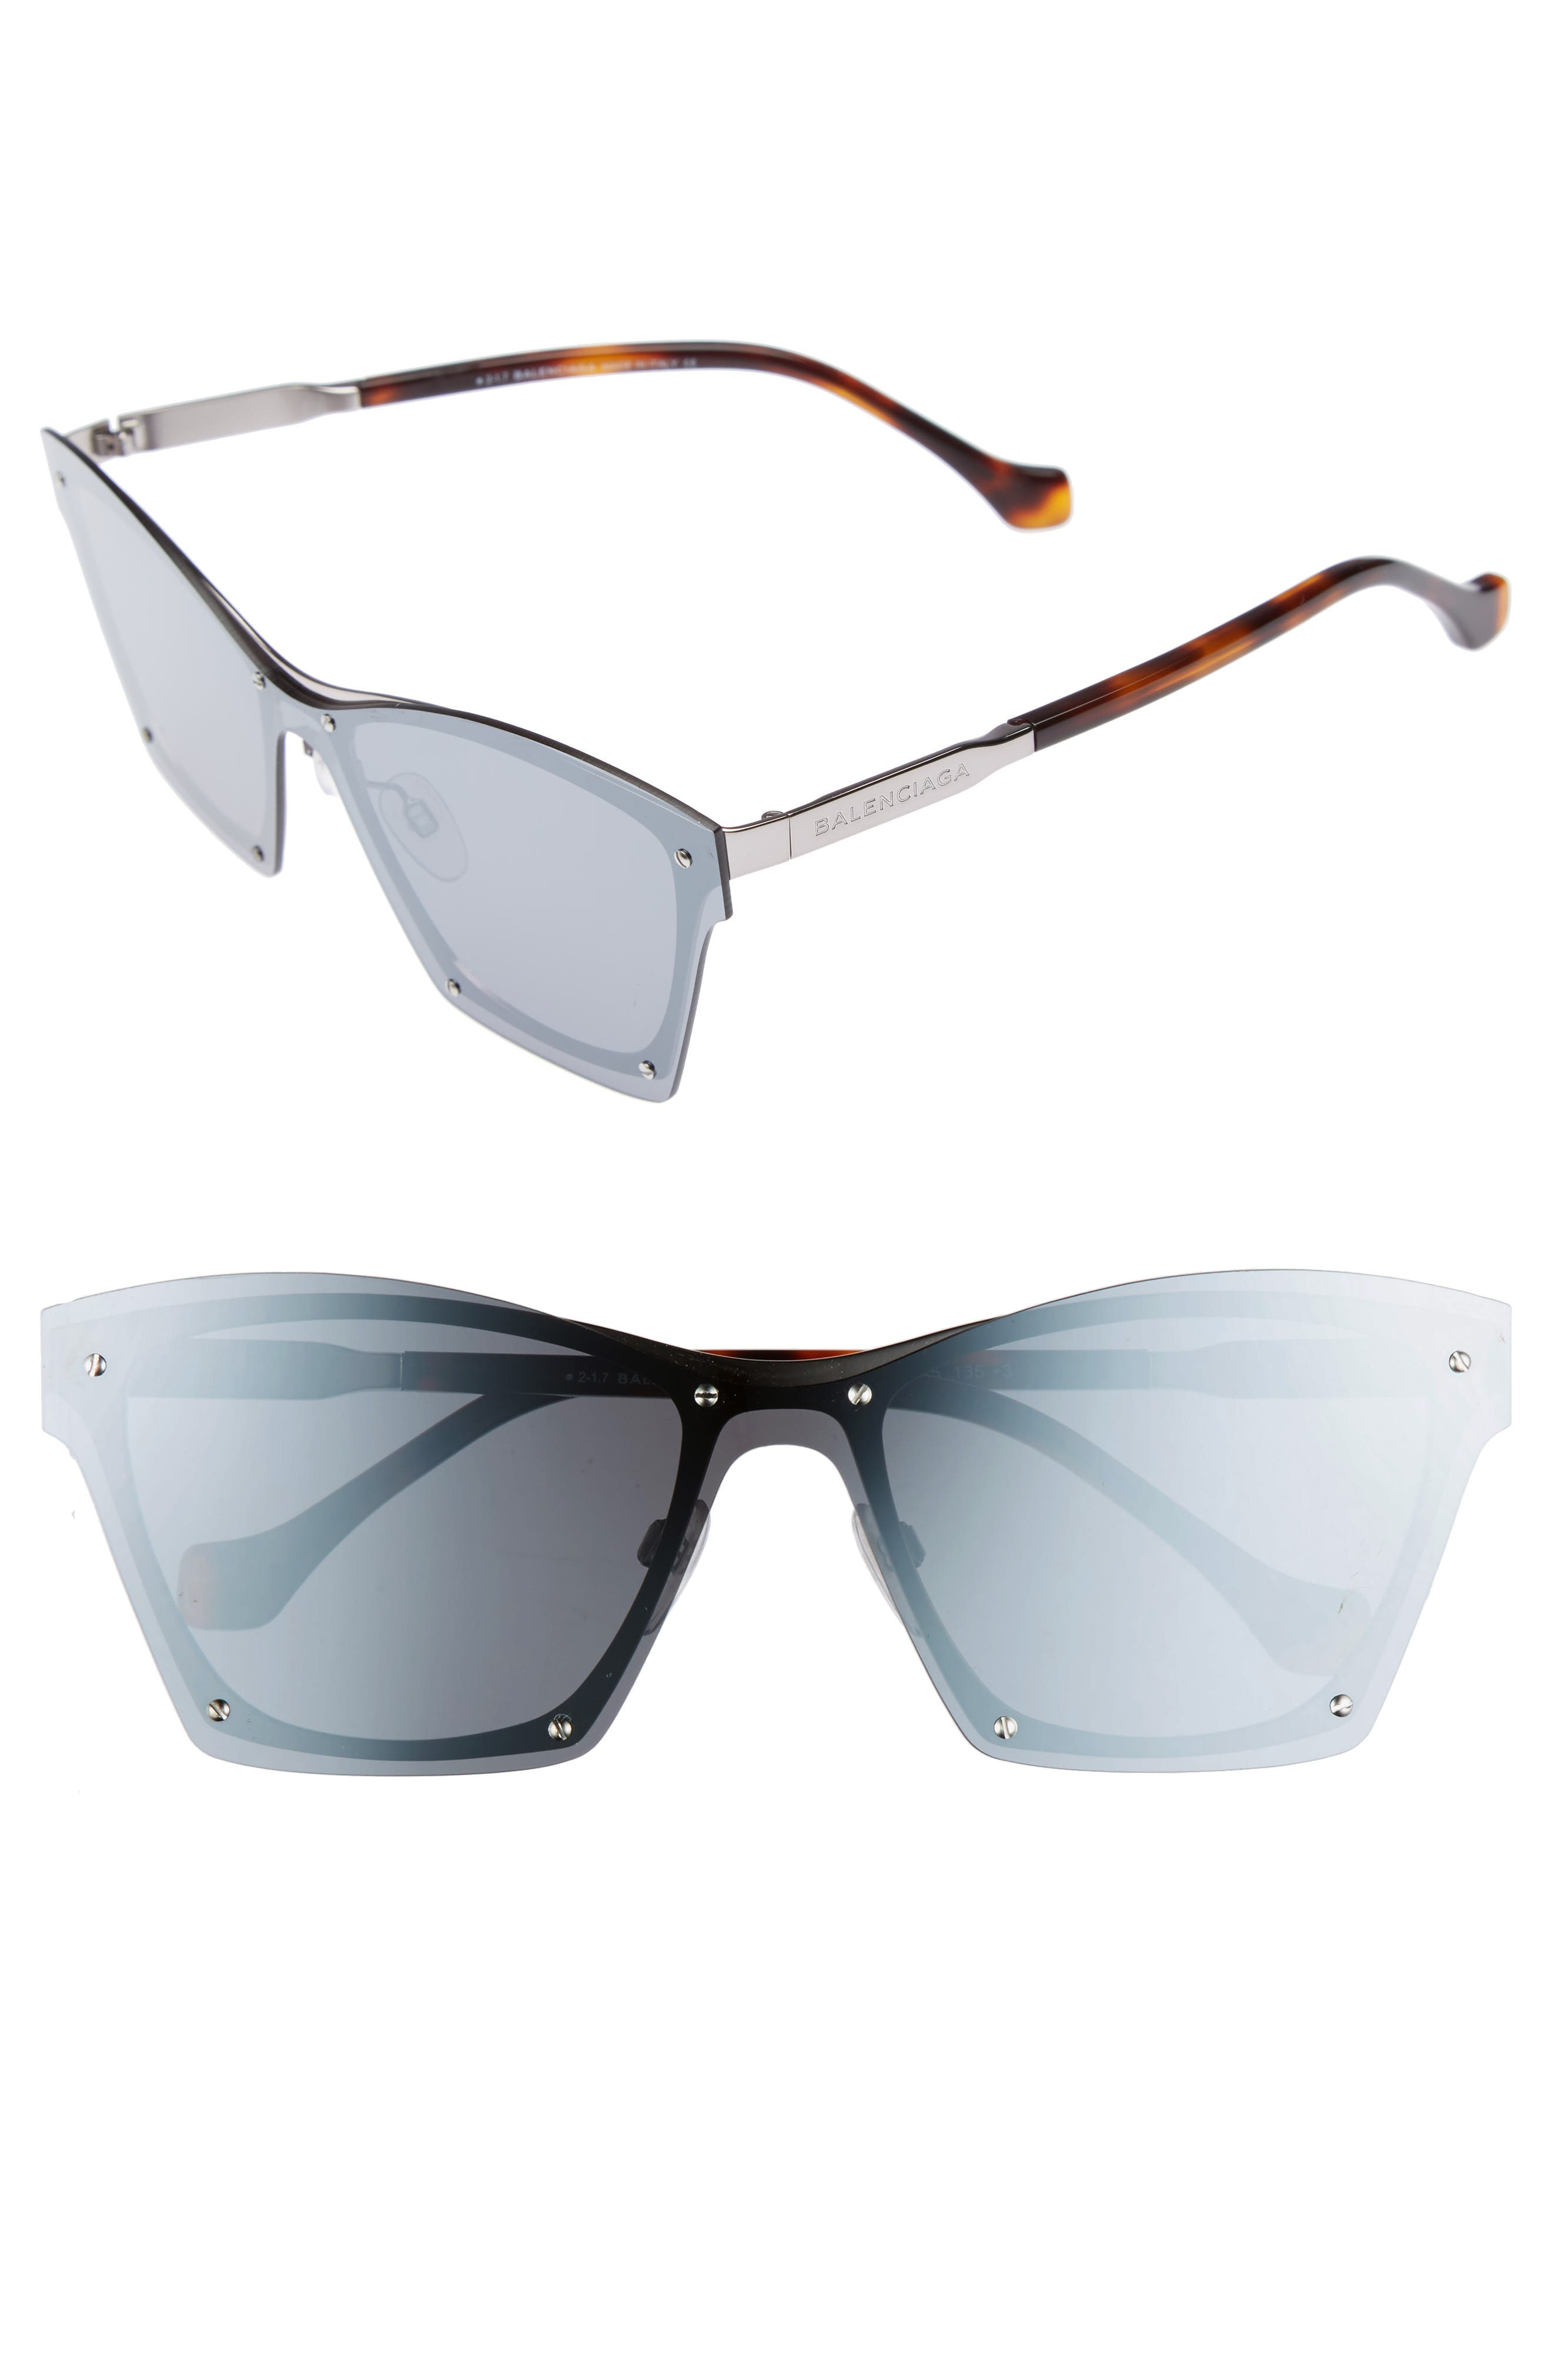 55mm Frameless Sunglasses,                             Main thumbnail 1, color,                             040